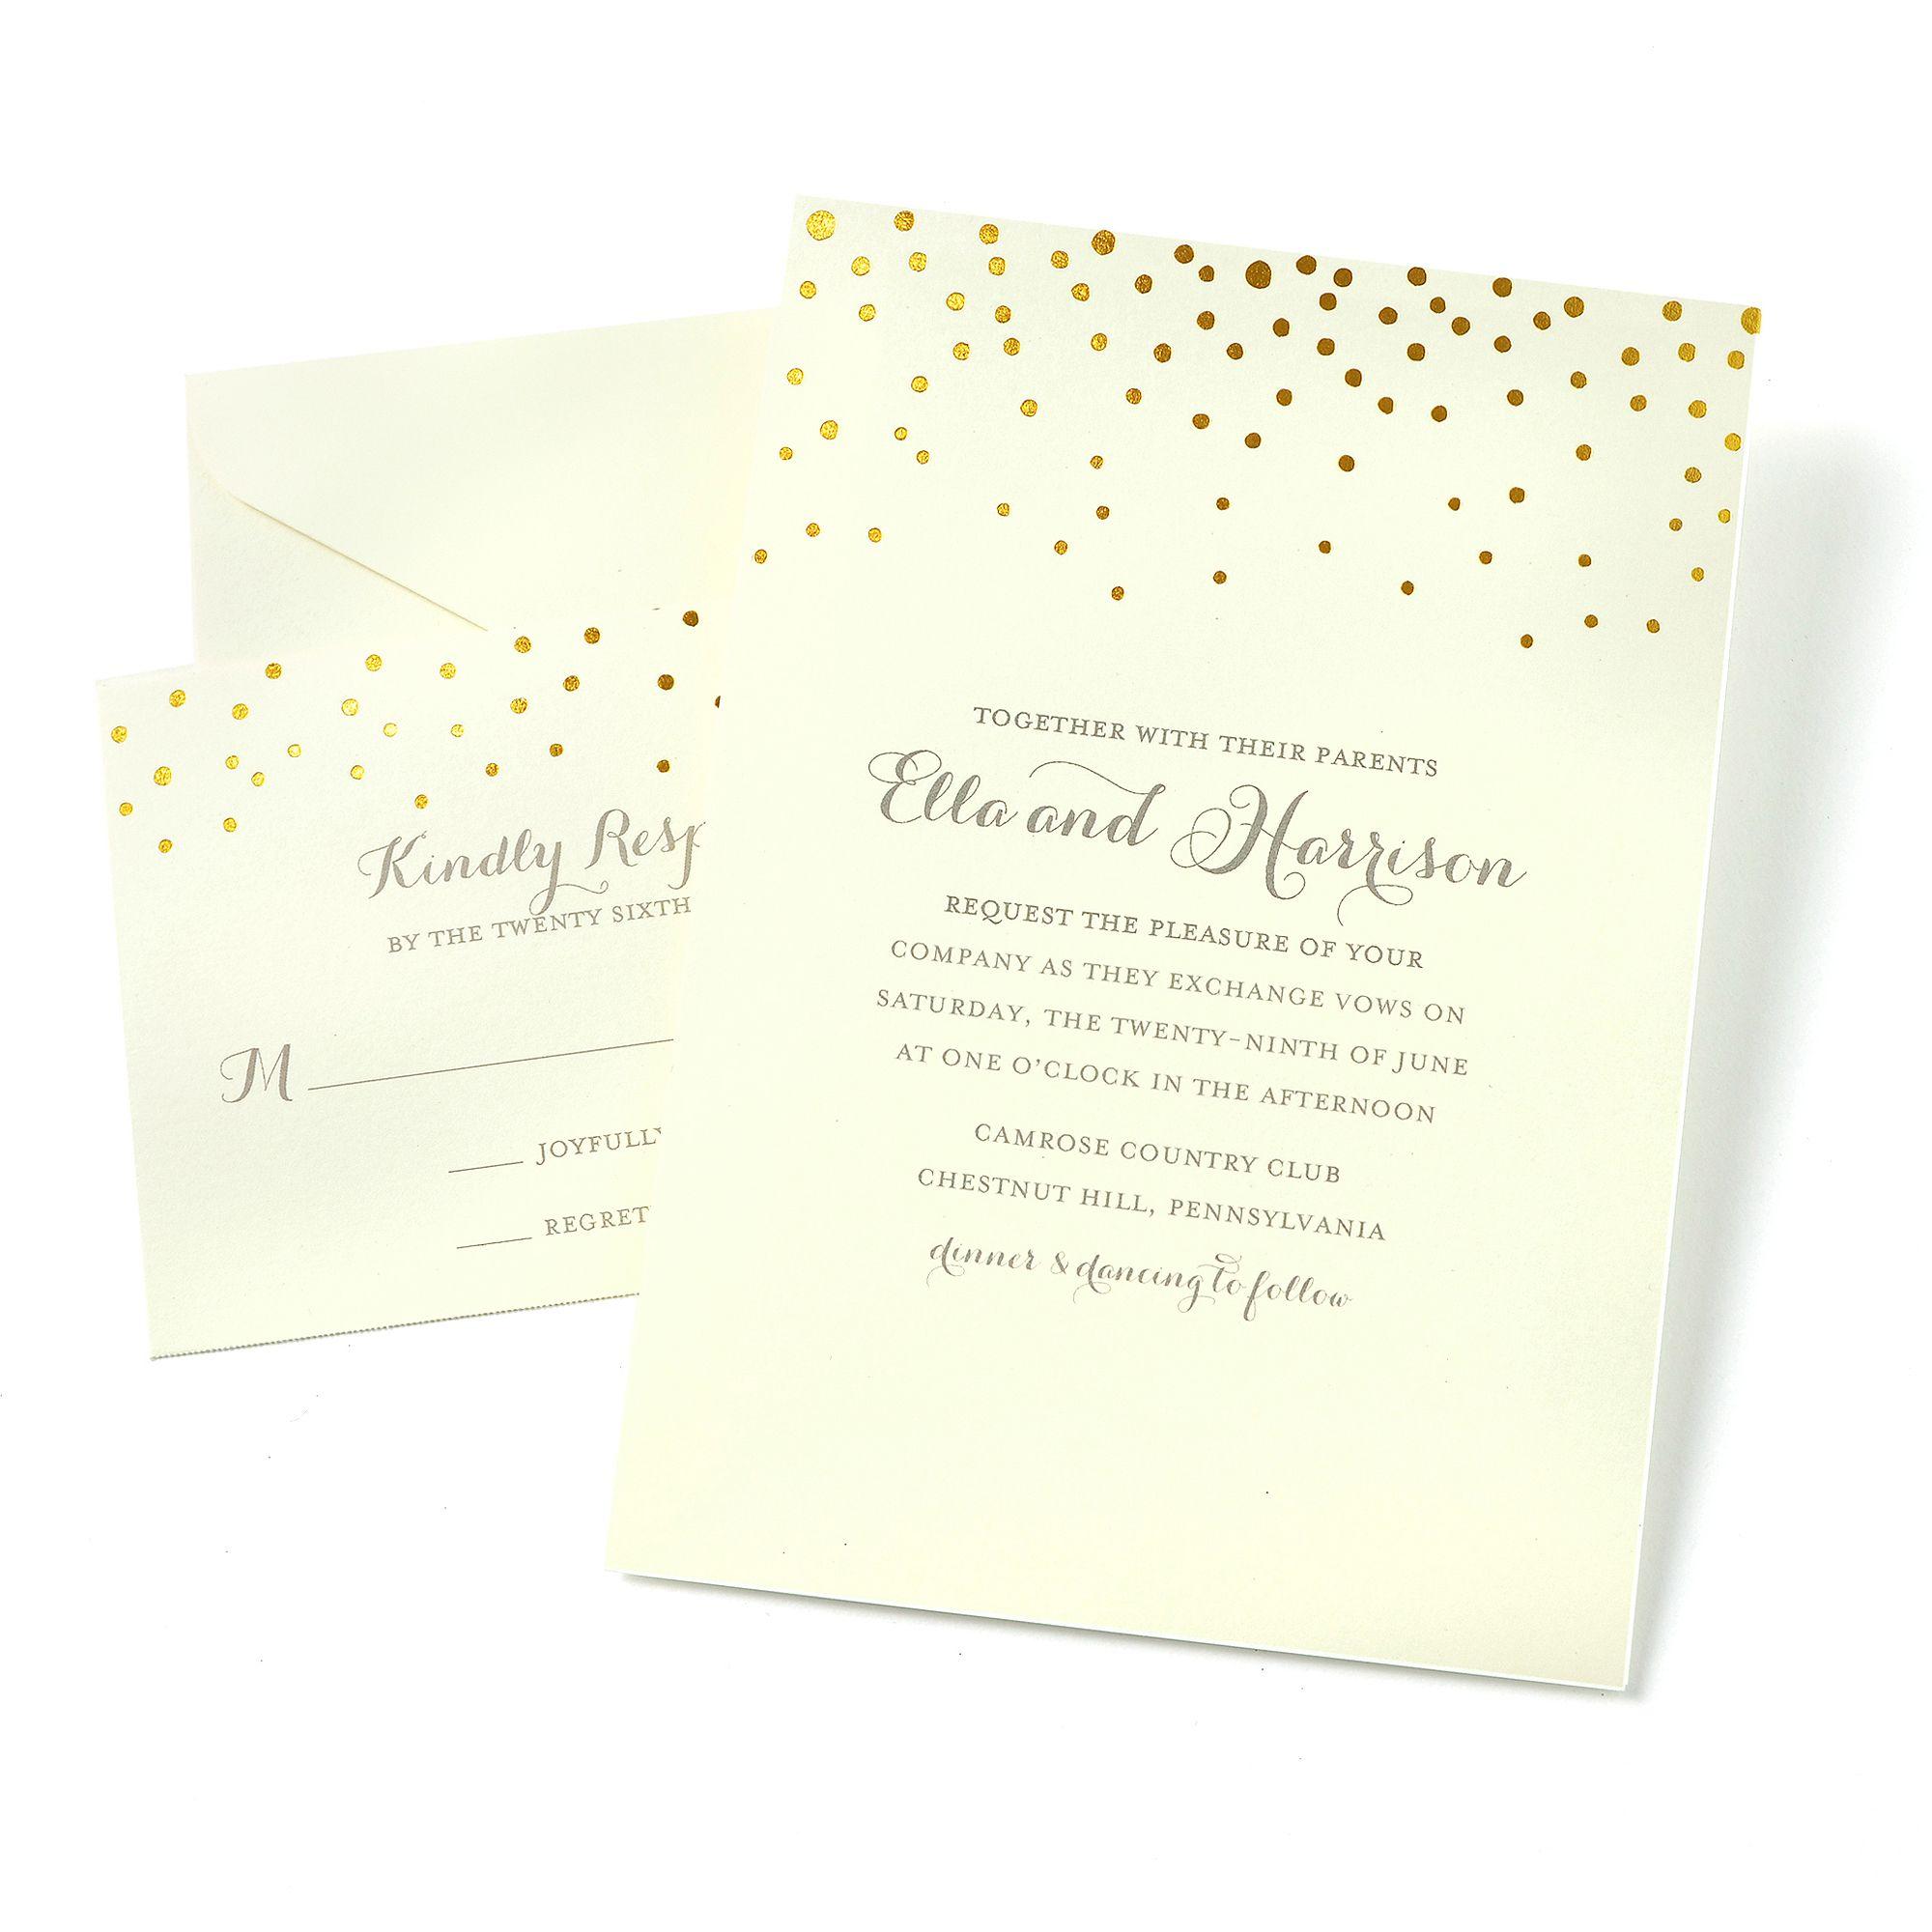 Tips For Choosing Walmart Wedding Invites Designs Looking Design For Gart Wedding Invitation Kits Create Wedding Invitations Make Your Own Wedding Invitations